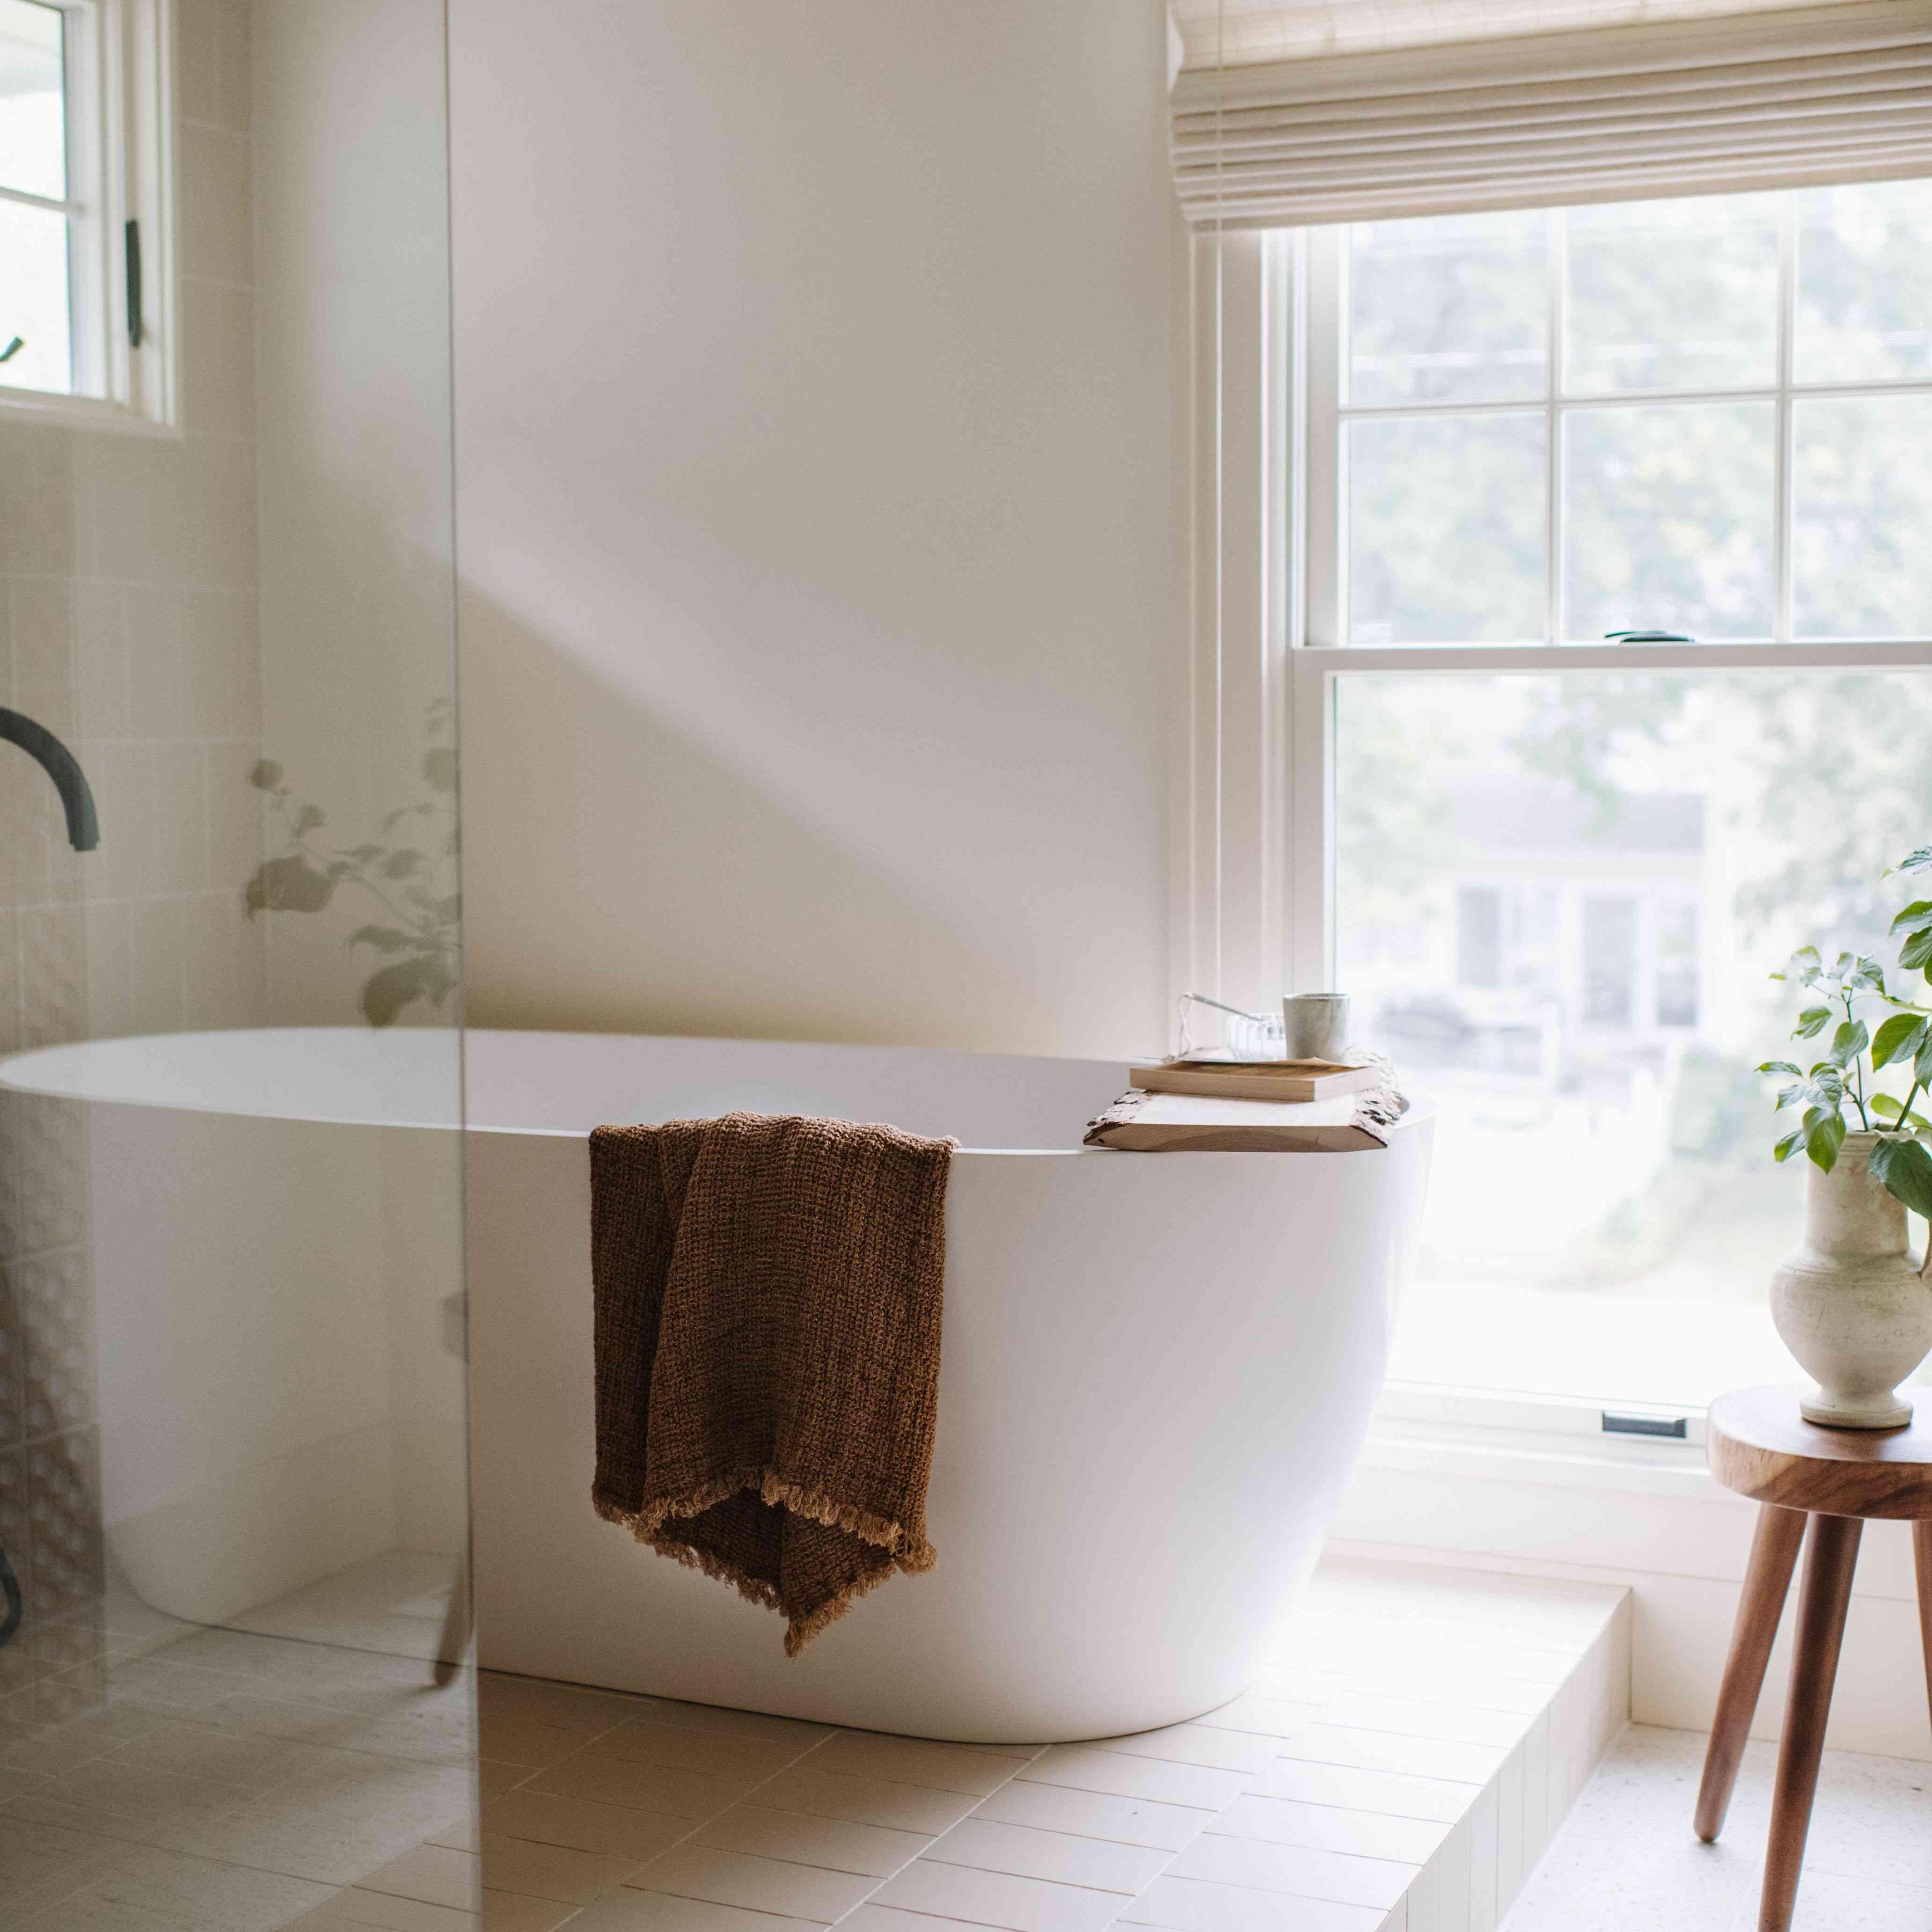 Glass shower and bathtub on bathing platform